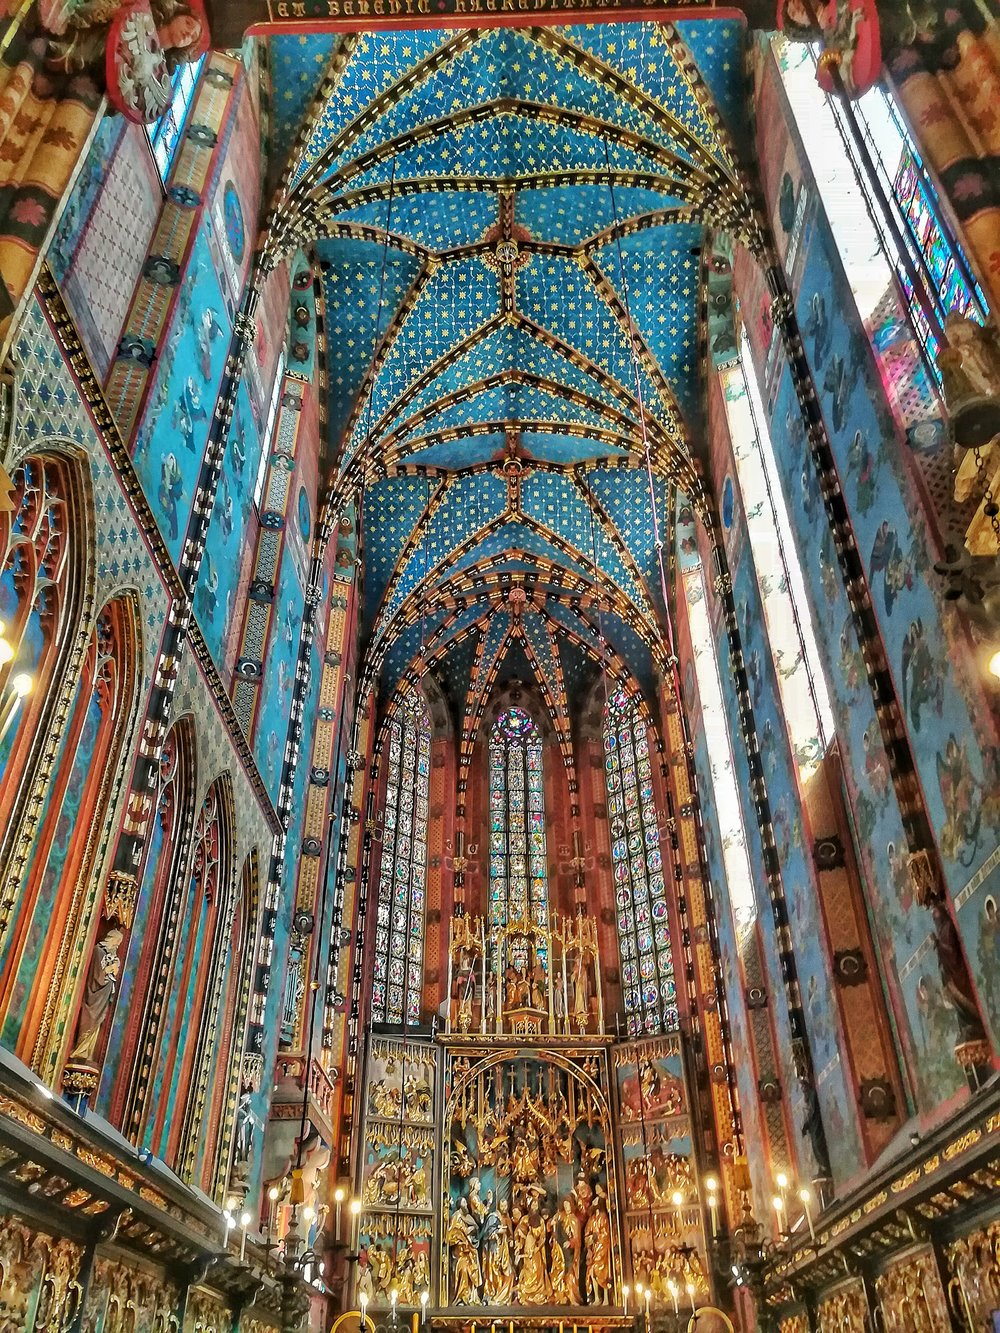 The all impressive st. Mary's basilica!